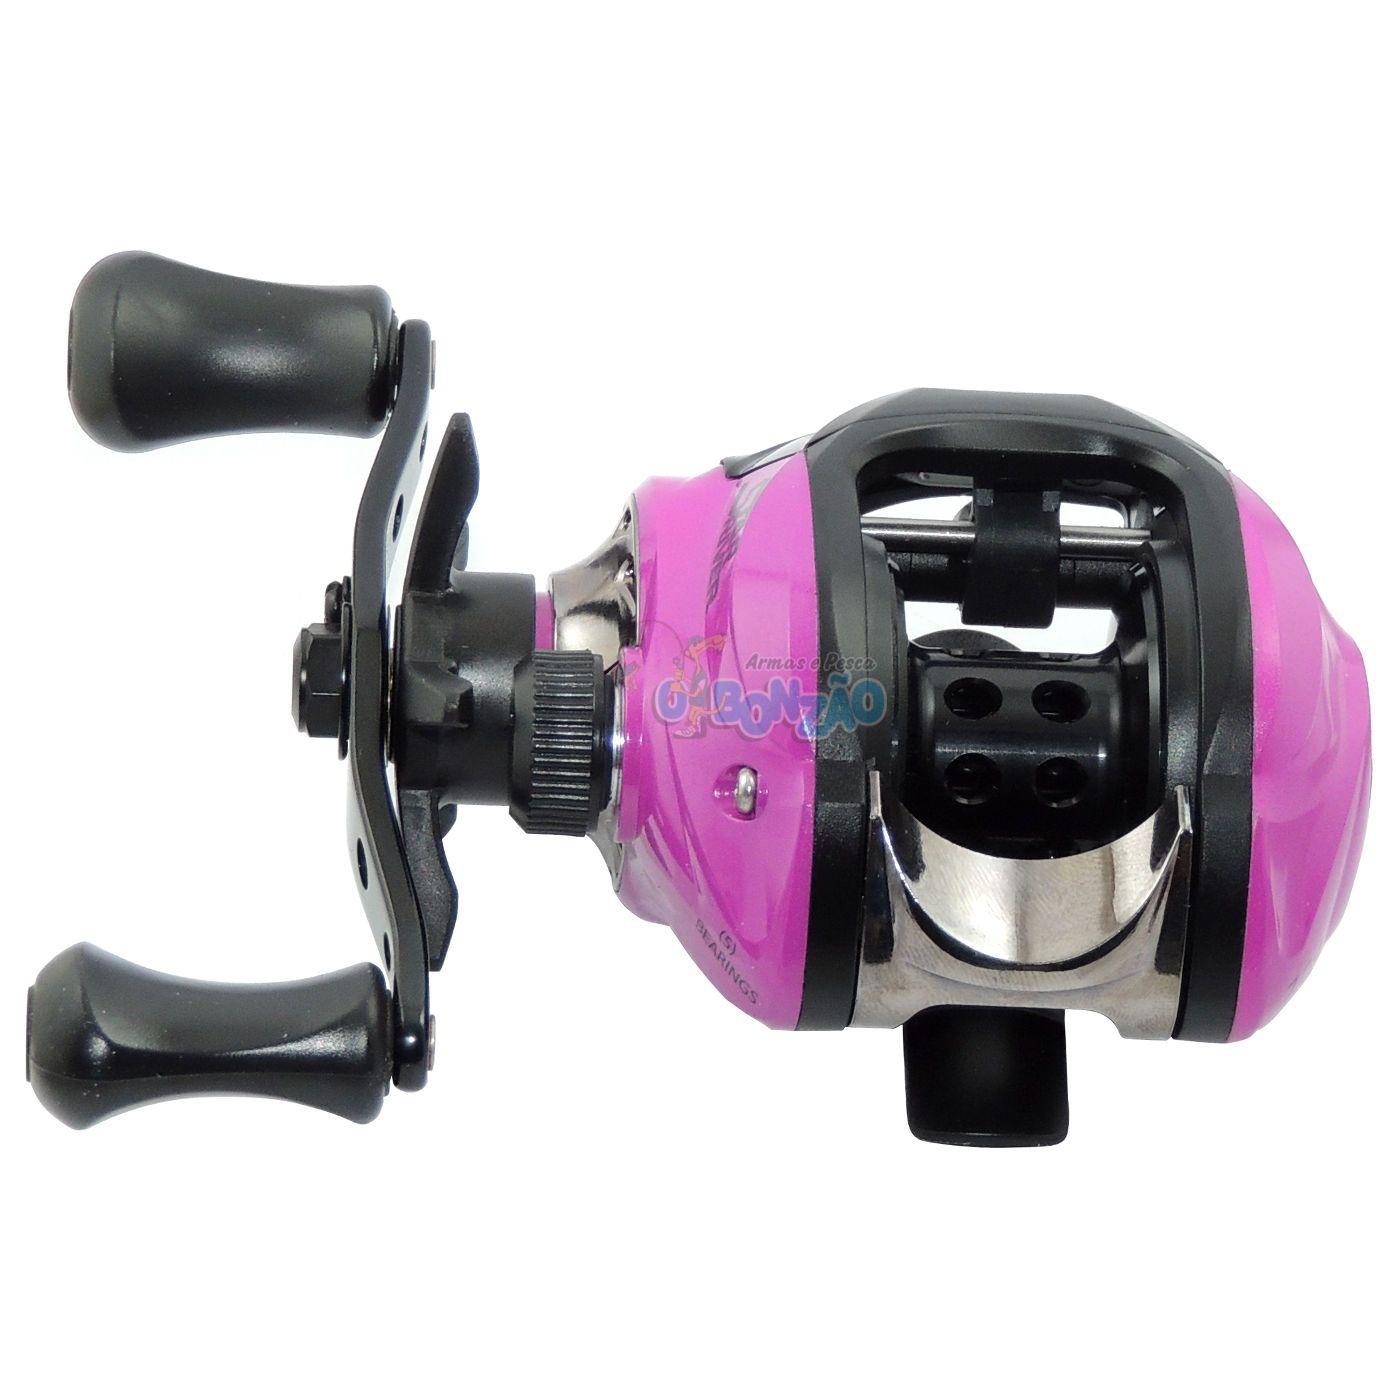 Carretilha Star River Pink Fish LH - Esquerda - 5 Rolamentos